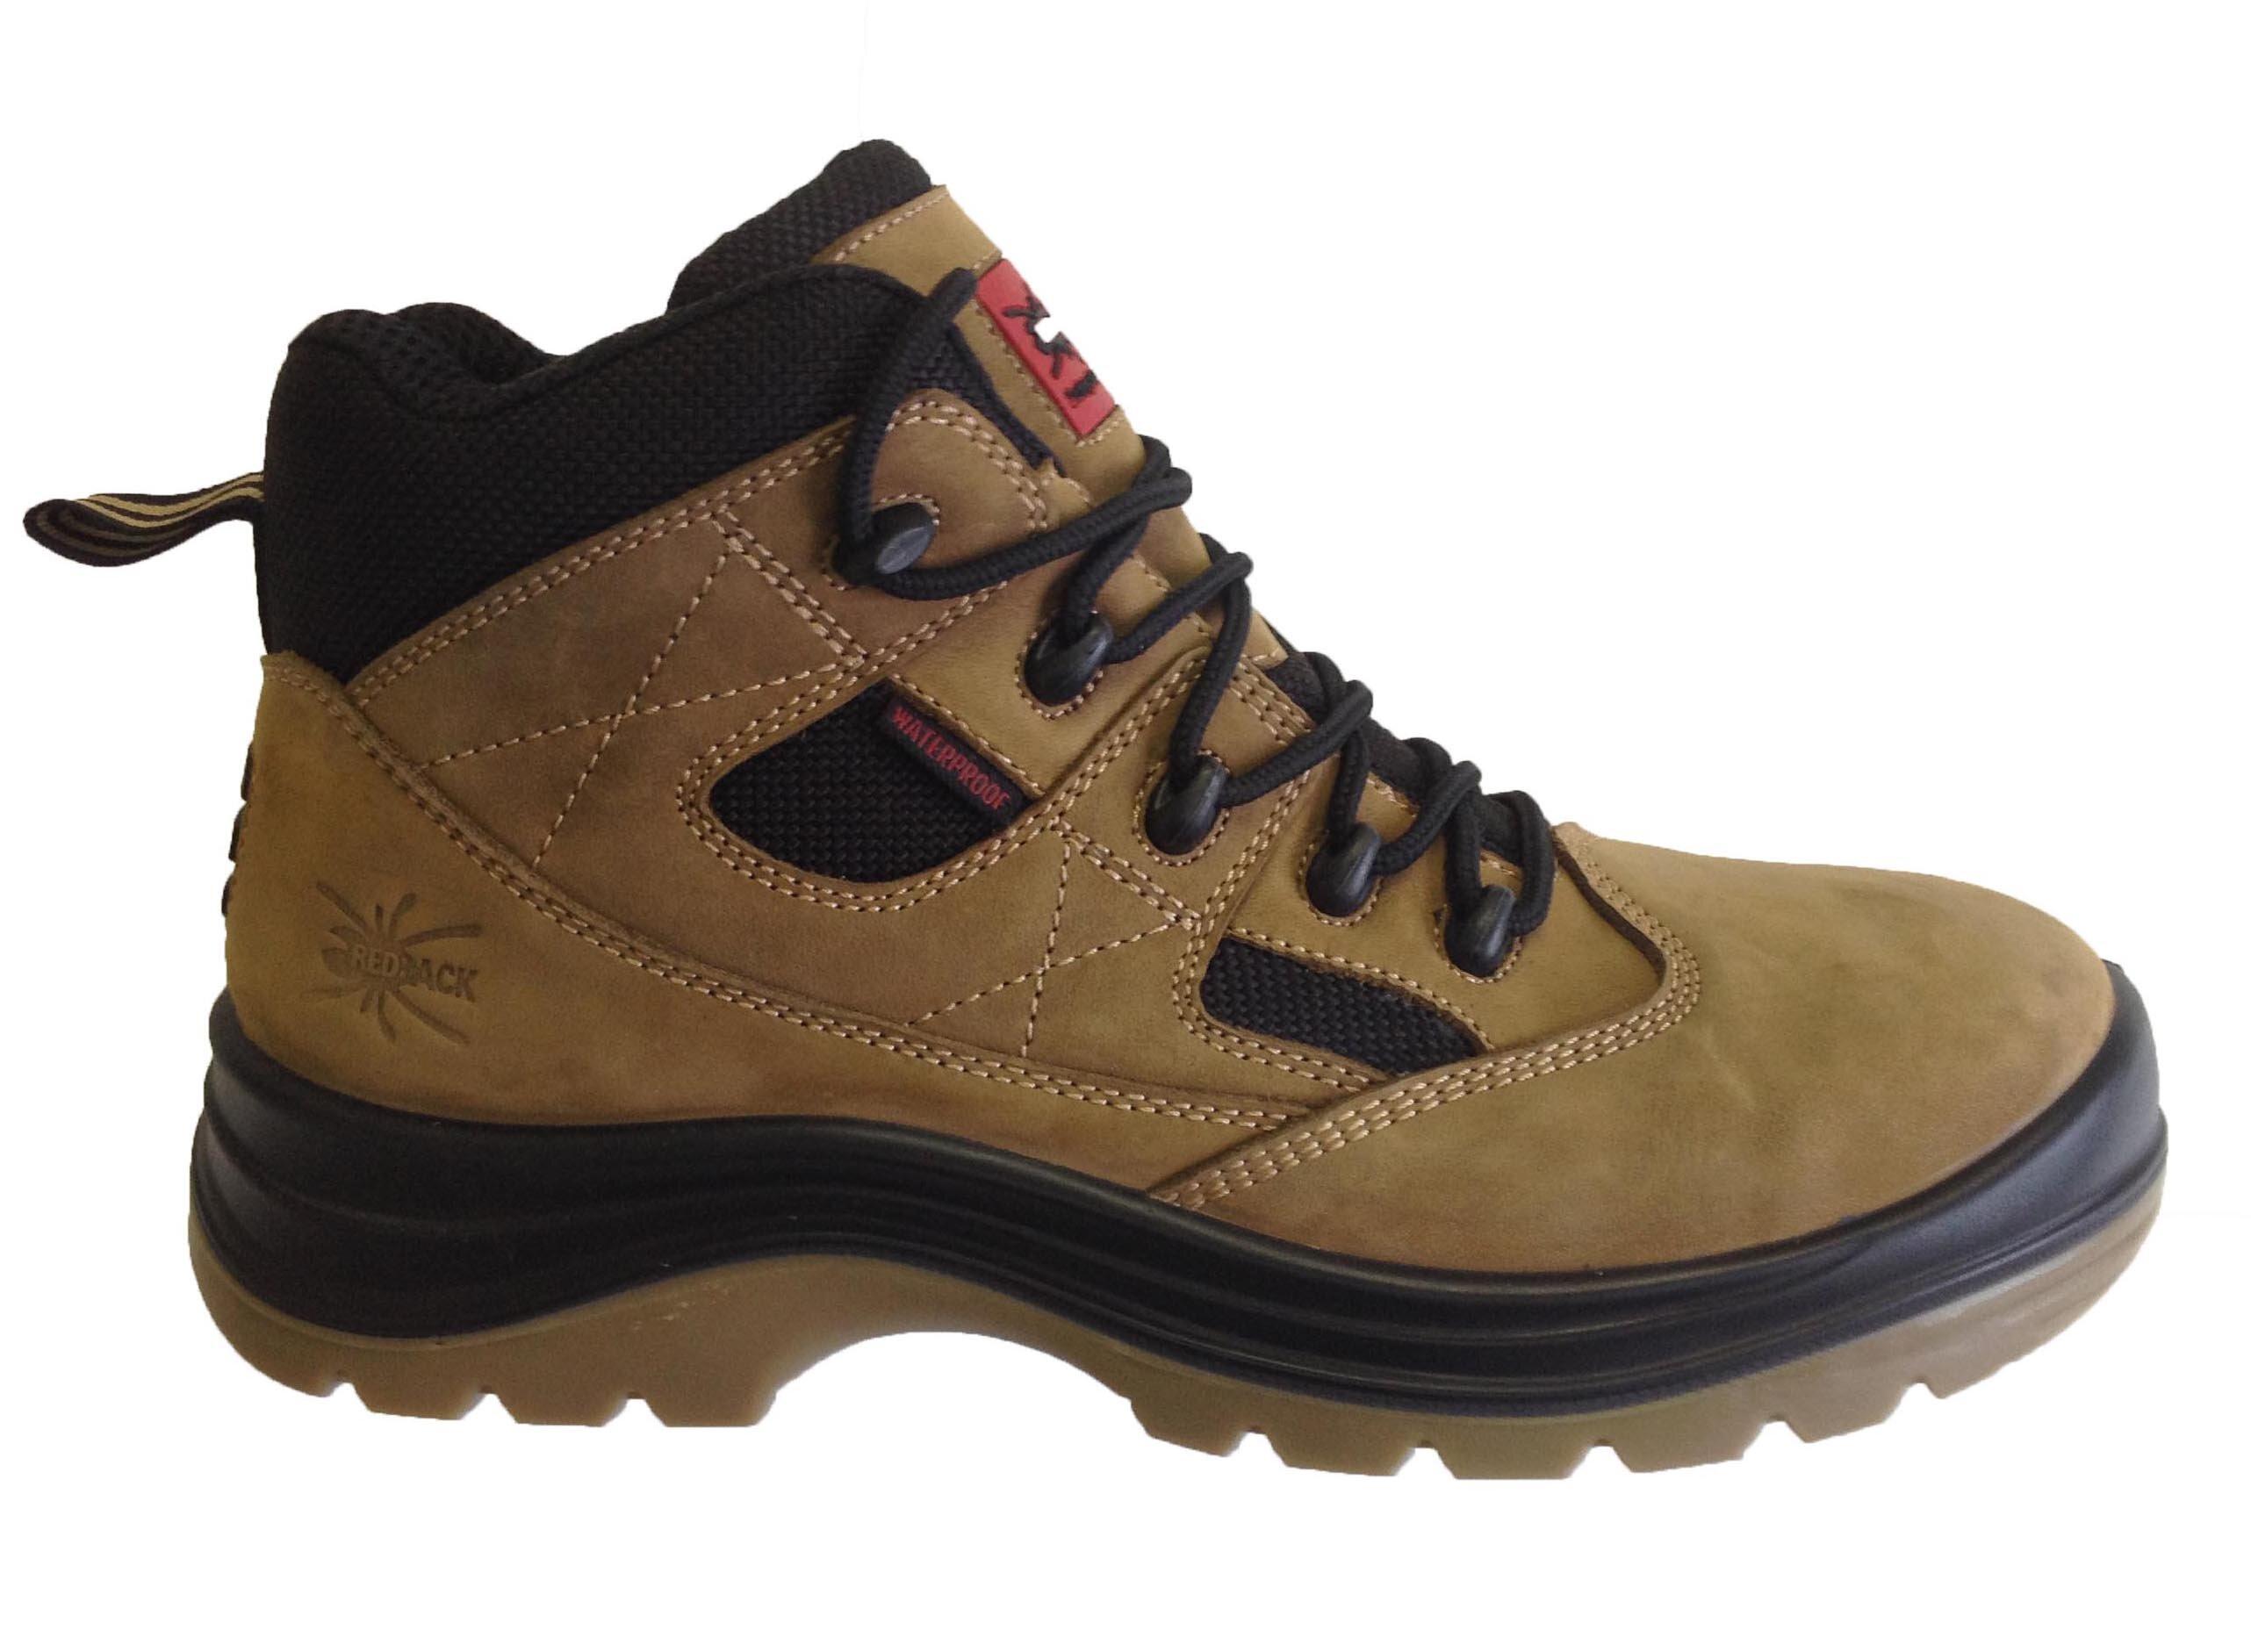 REDBACK Tornado Waterproof Boot S3 WR SRC (Composite Toe Cap)